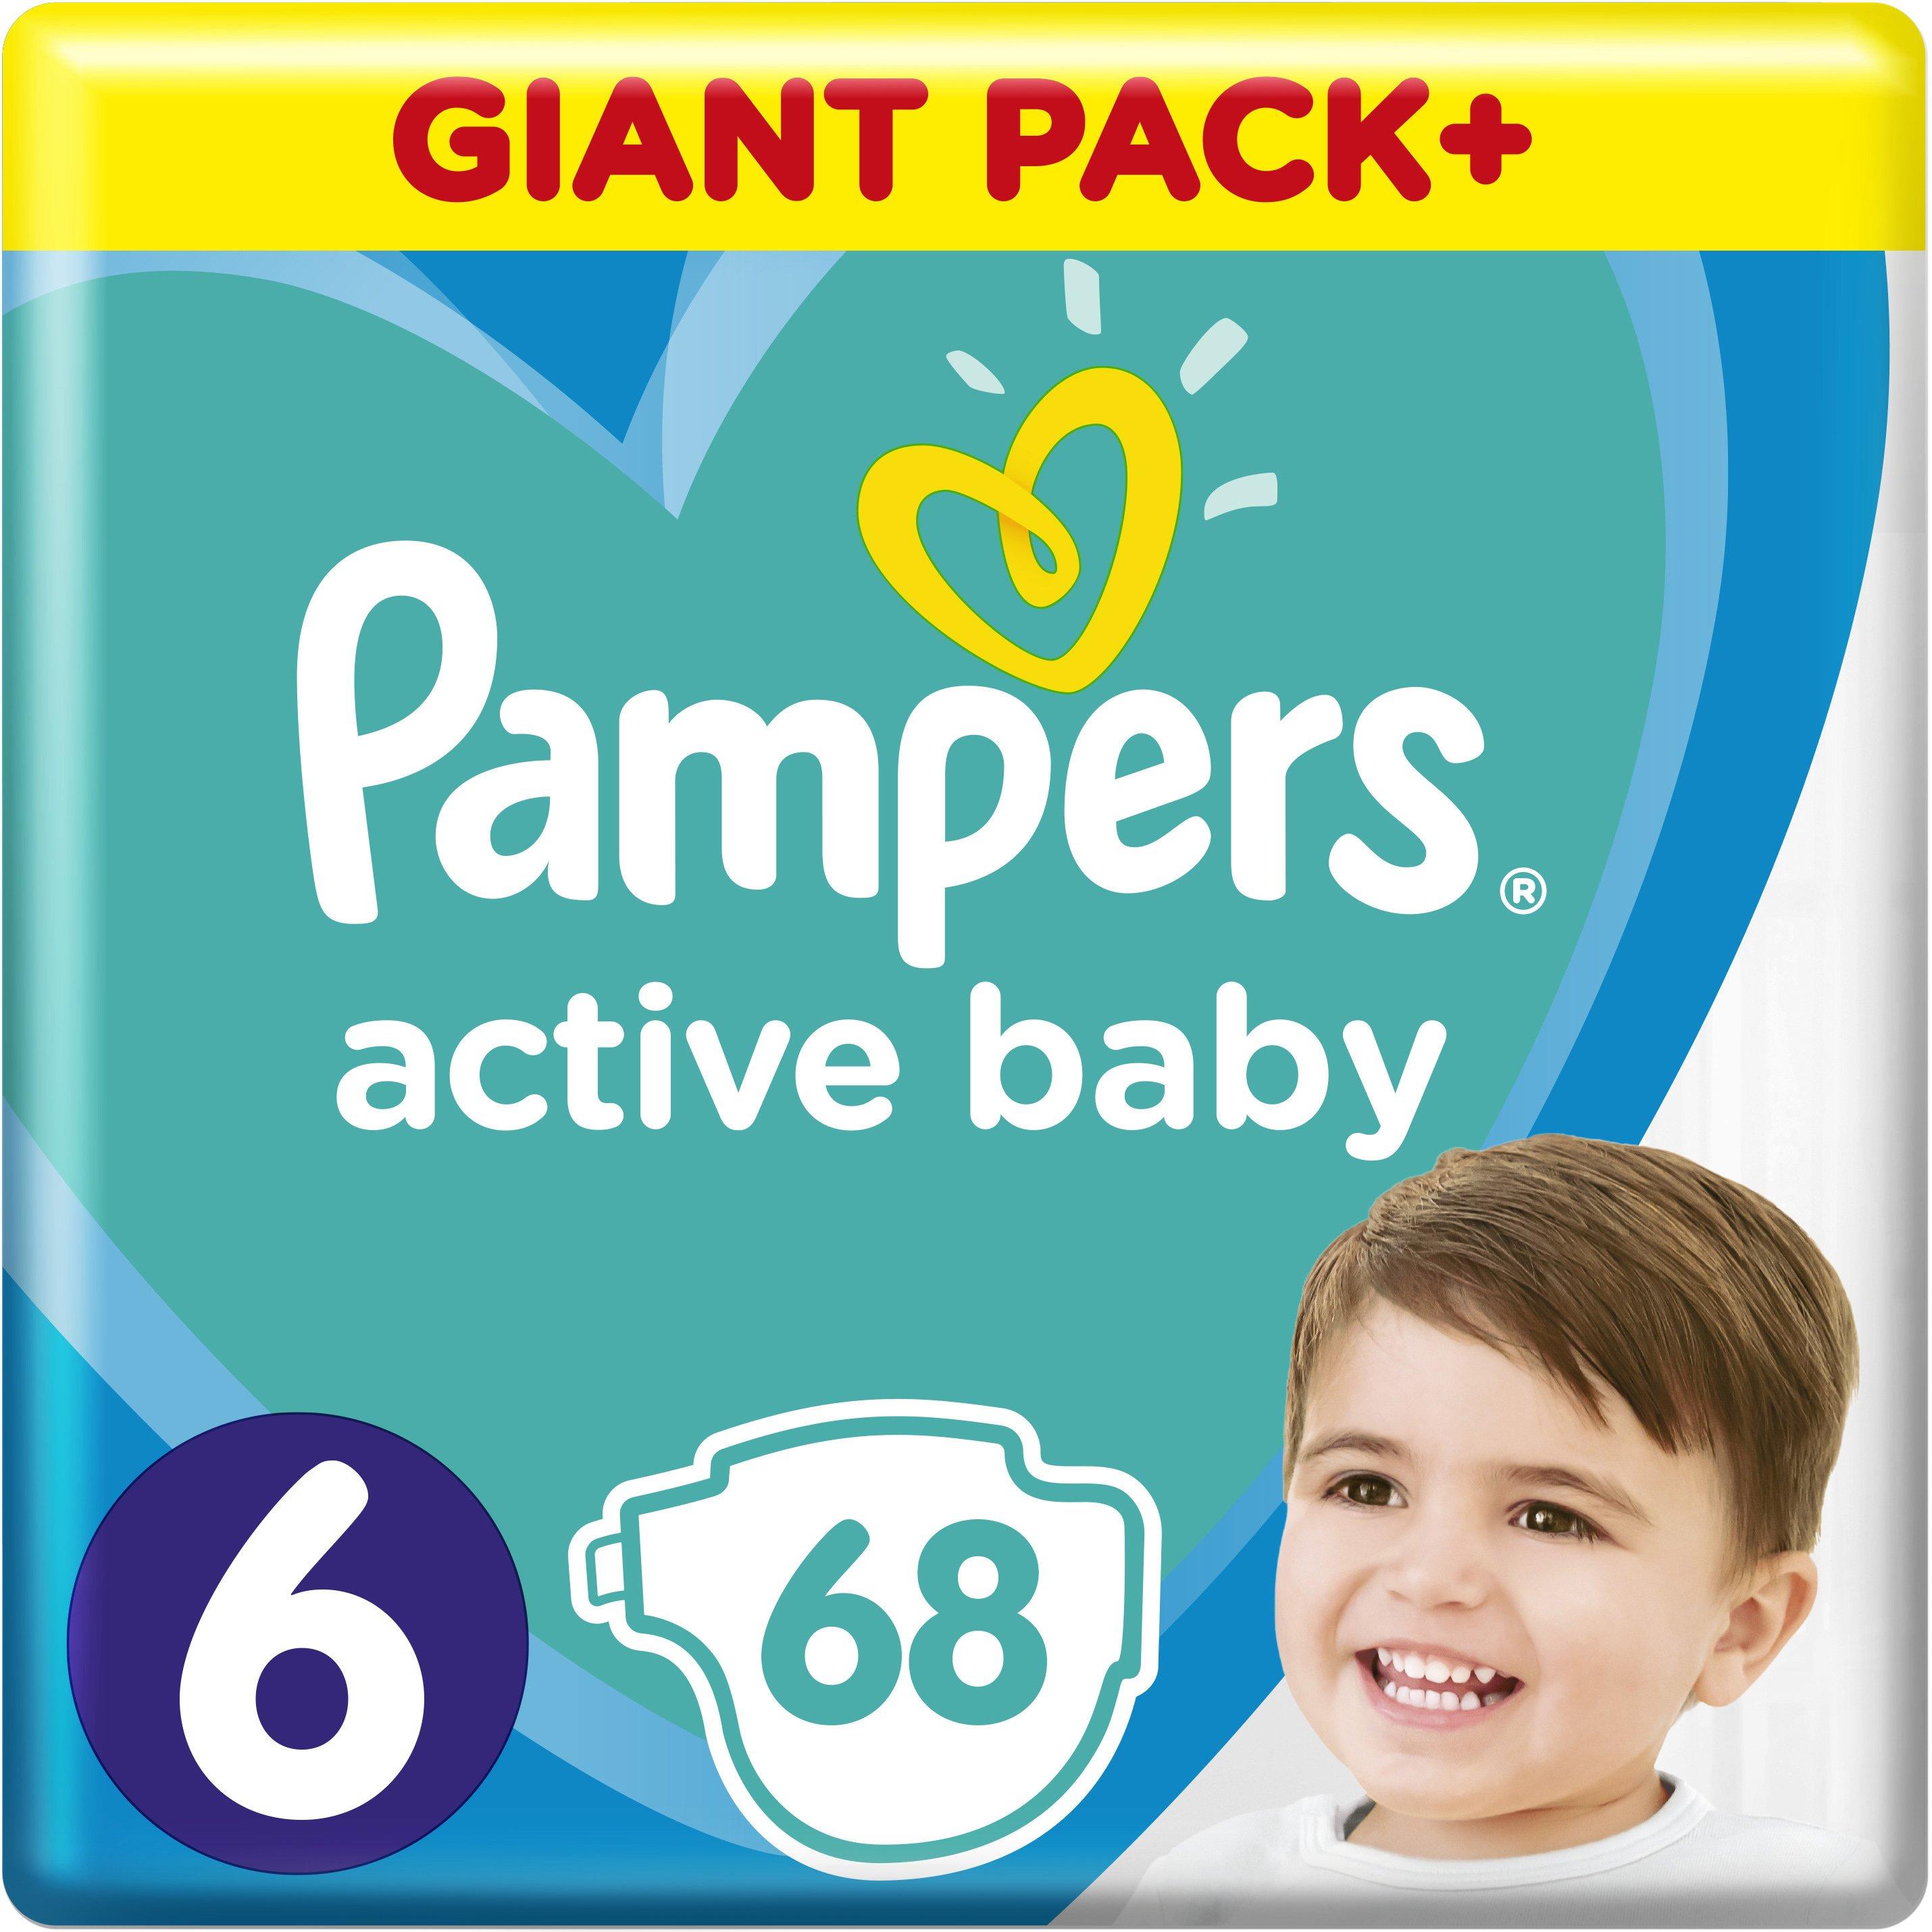 Pampers Active Baby Πάνες Giant Pack No6 (13-18 kg), 68 Πάνες μητέρα παιδί   περιποίηση για το μωρό   πάνες για το μωρό